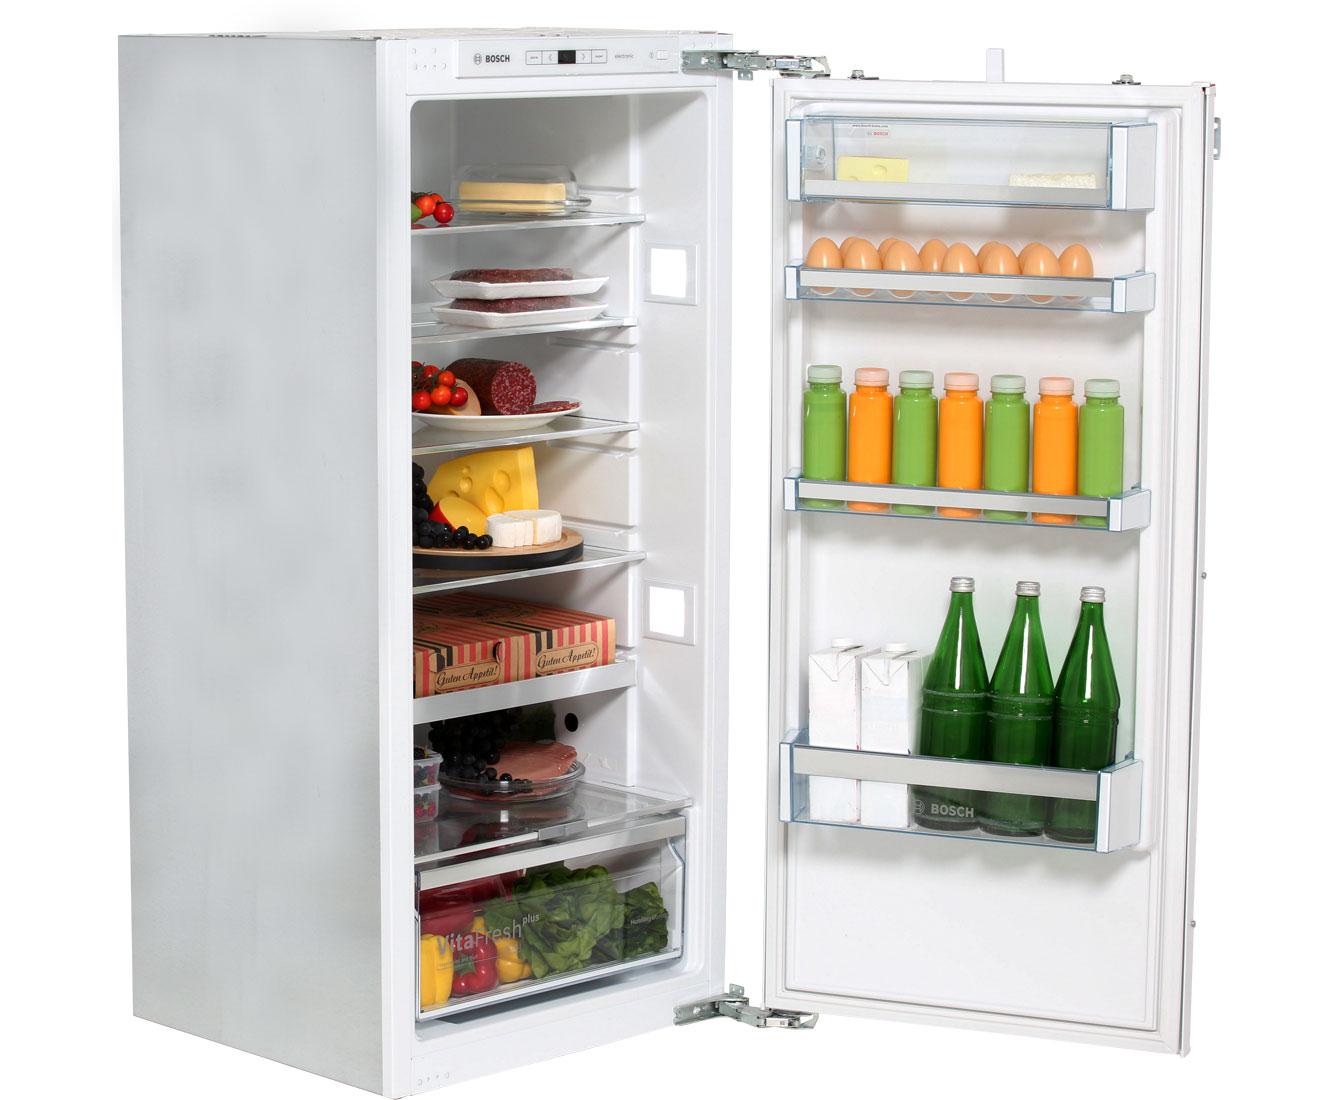 Bosch Kühlschrank Alarm : Bosch kir af kühlschrank serie eingebaut cm weiß neu ebay